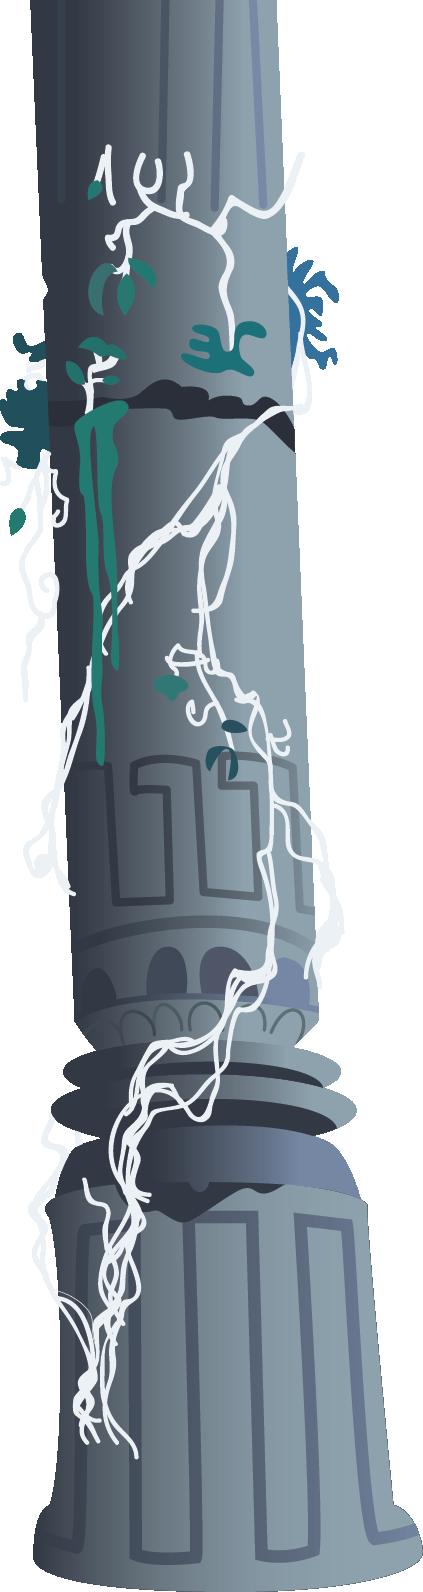 MLP Ruined Pillar by Evilbob0